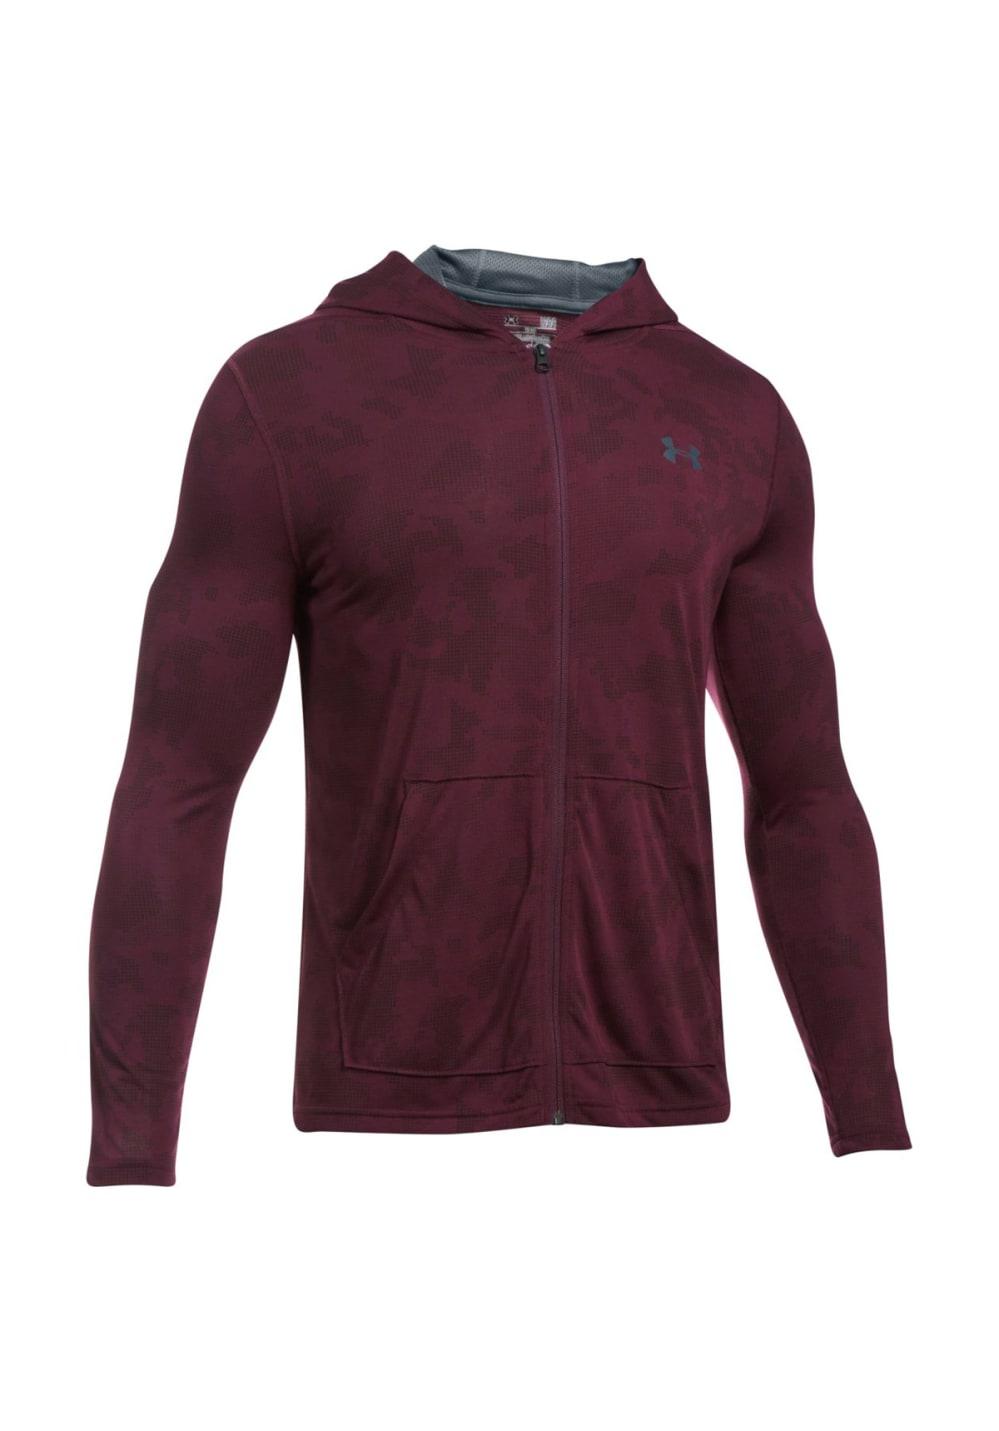 50591c2aba Under Armour Threadborne Fitted Full Zip Hoodie - Sweatshirts / Hoodies for  Men - Red